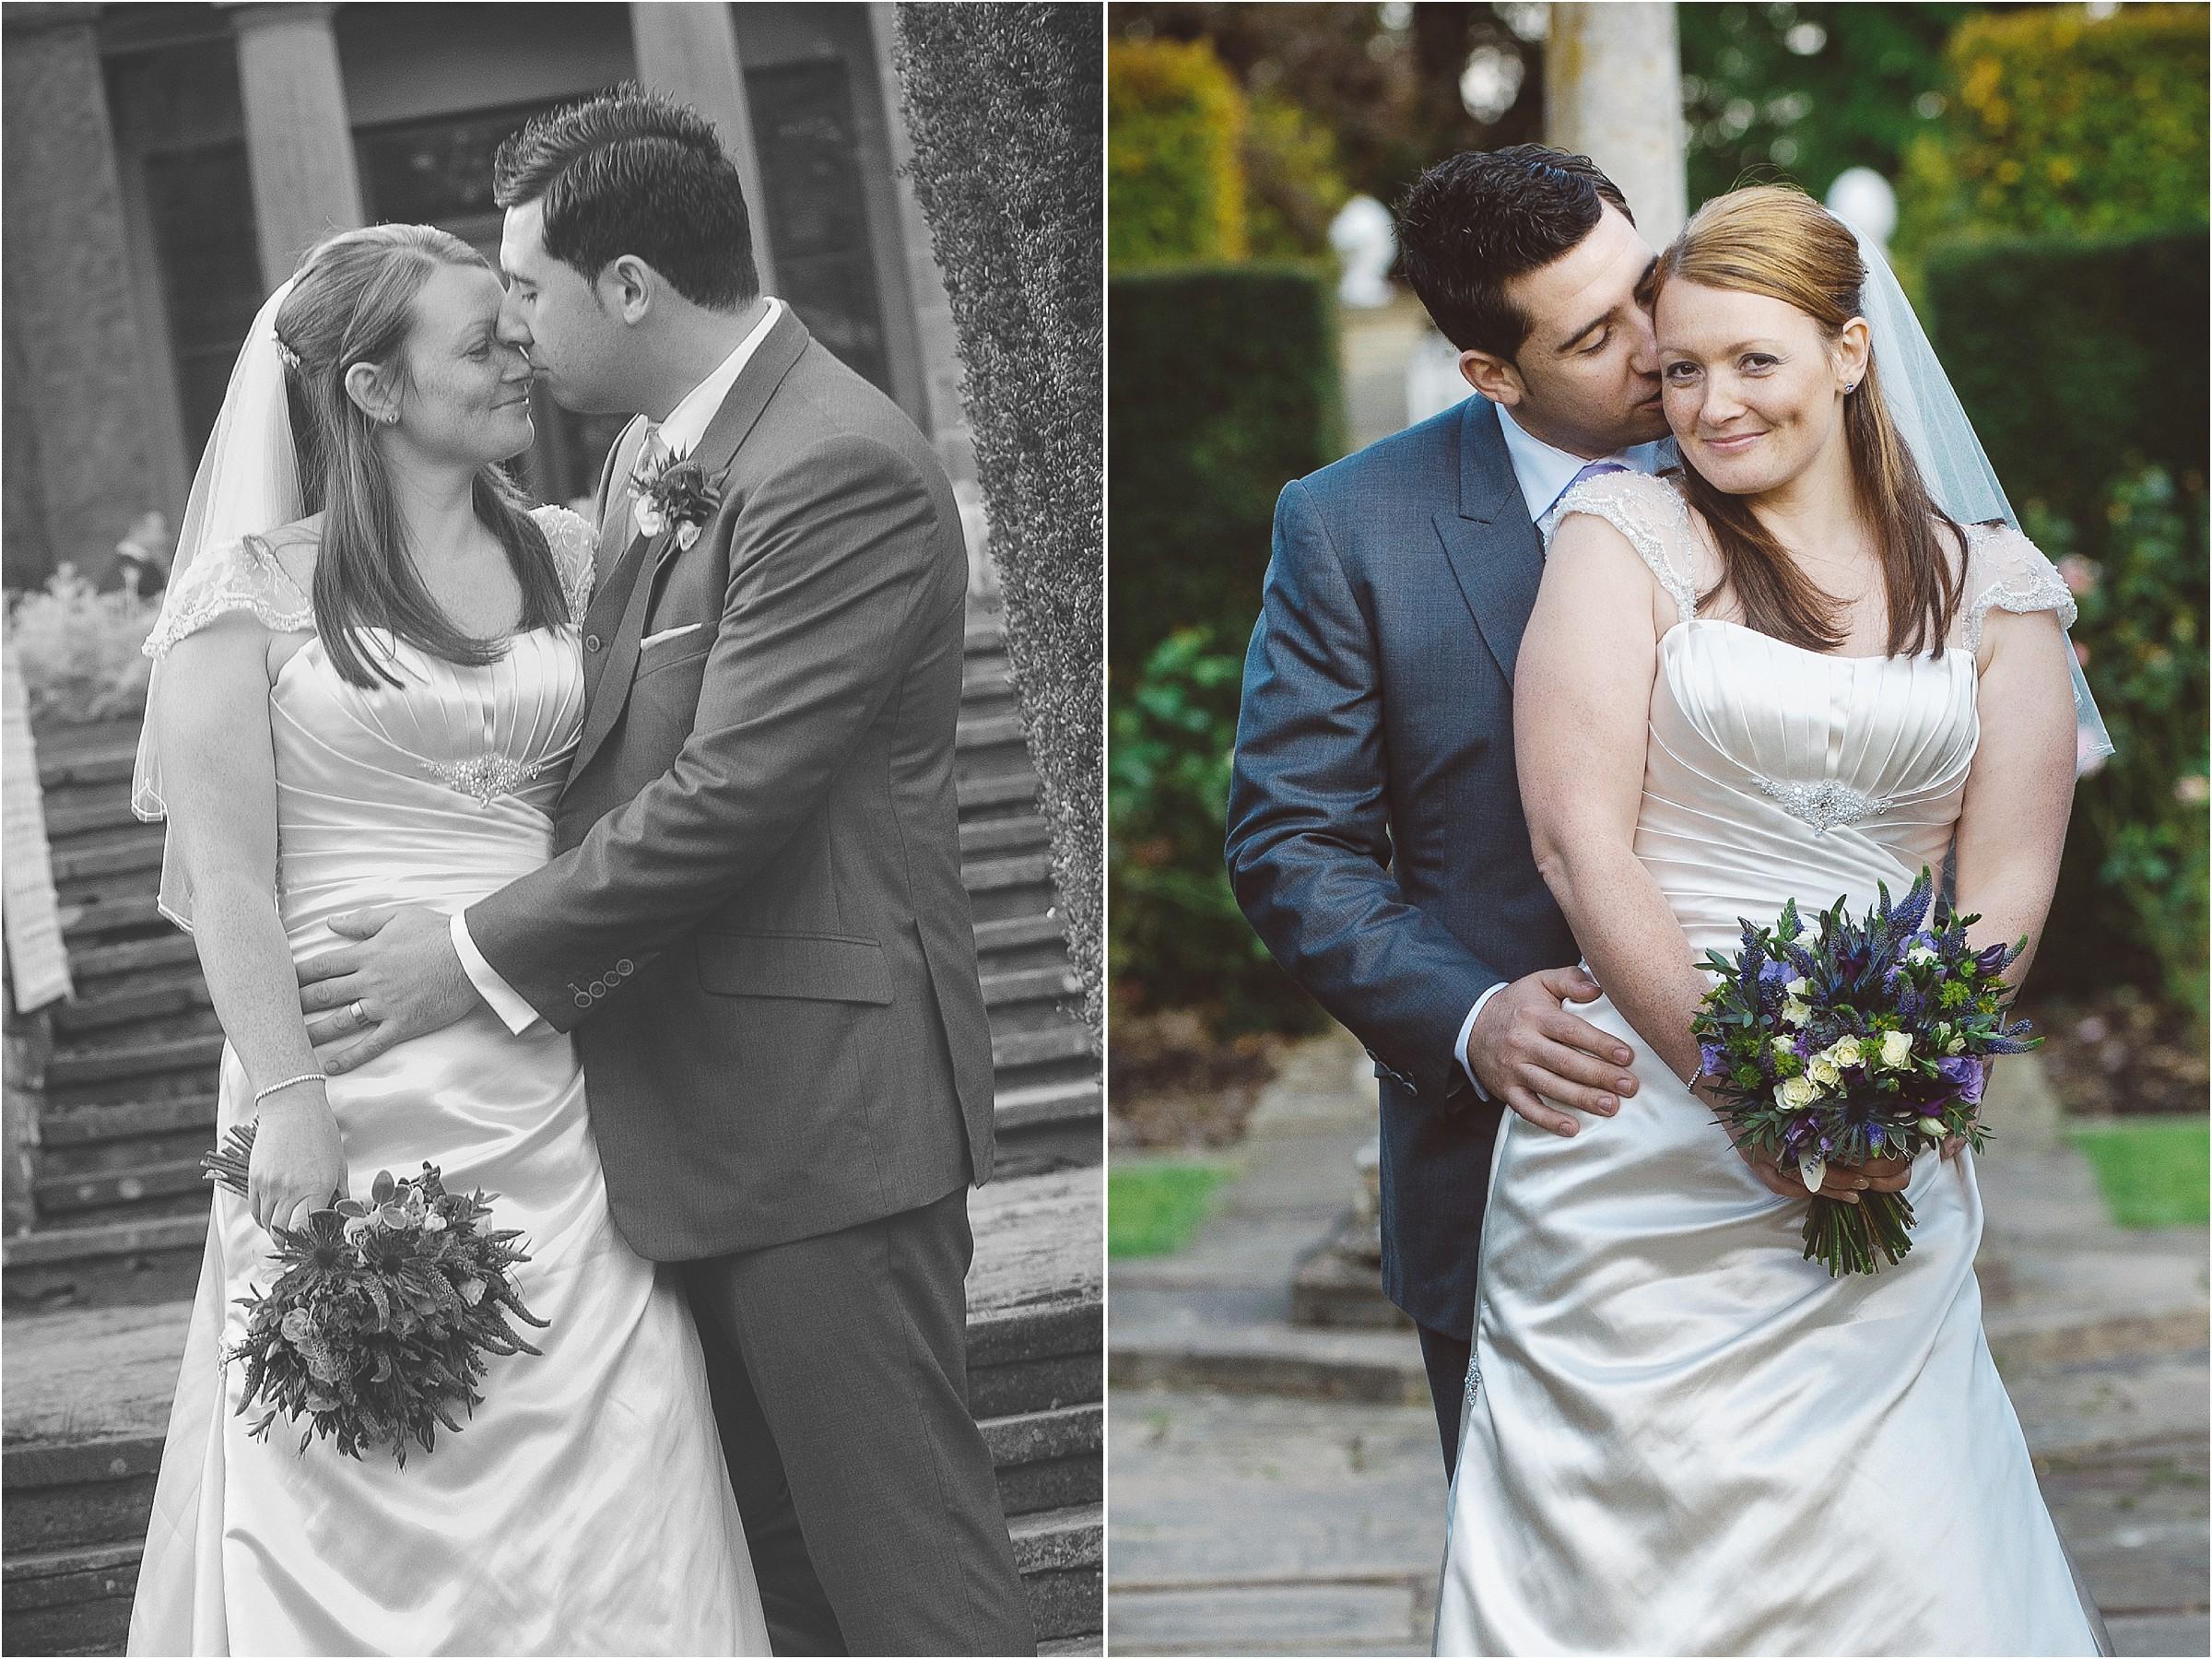 035 wedding photography doxford hall northumberlandDSC_0842e